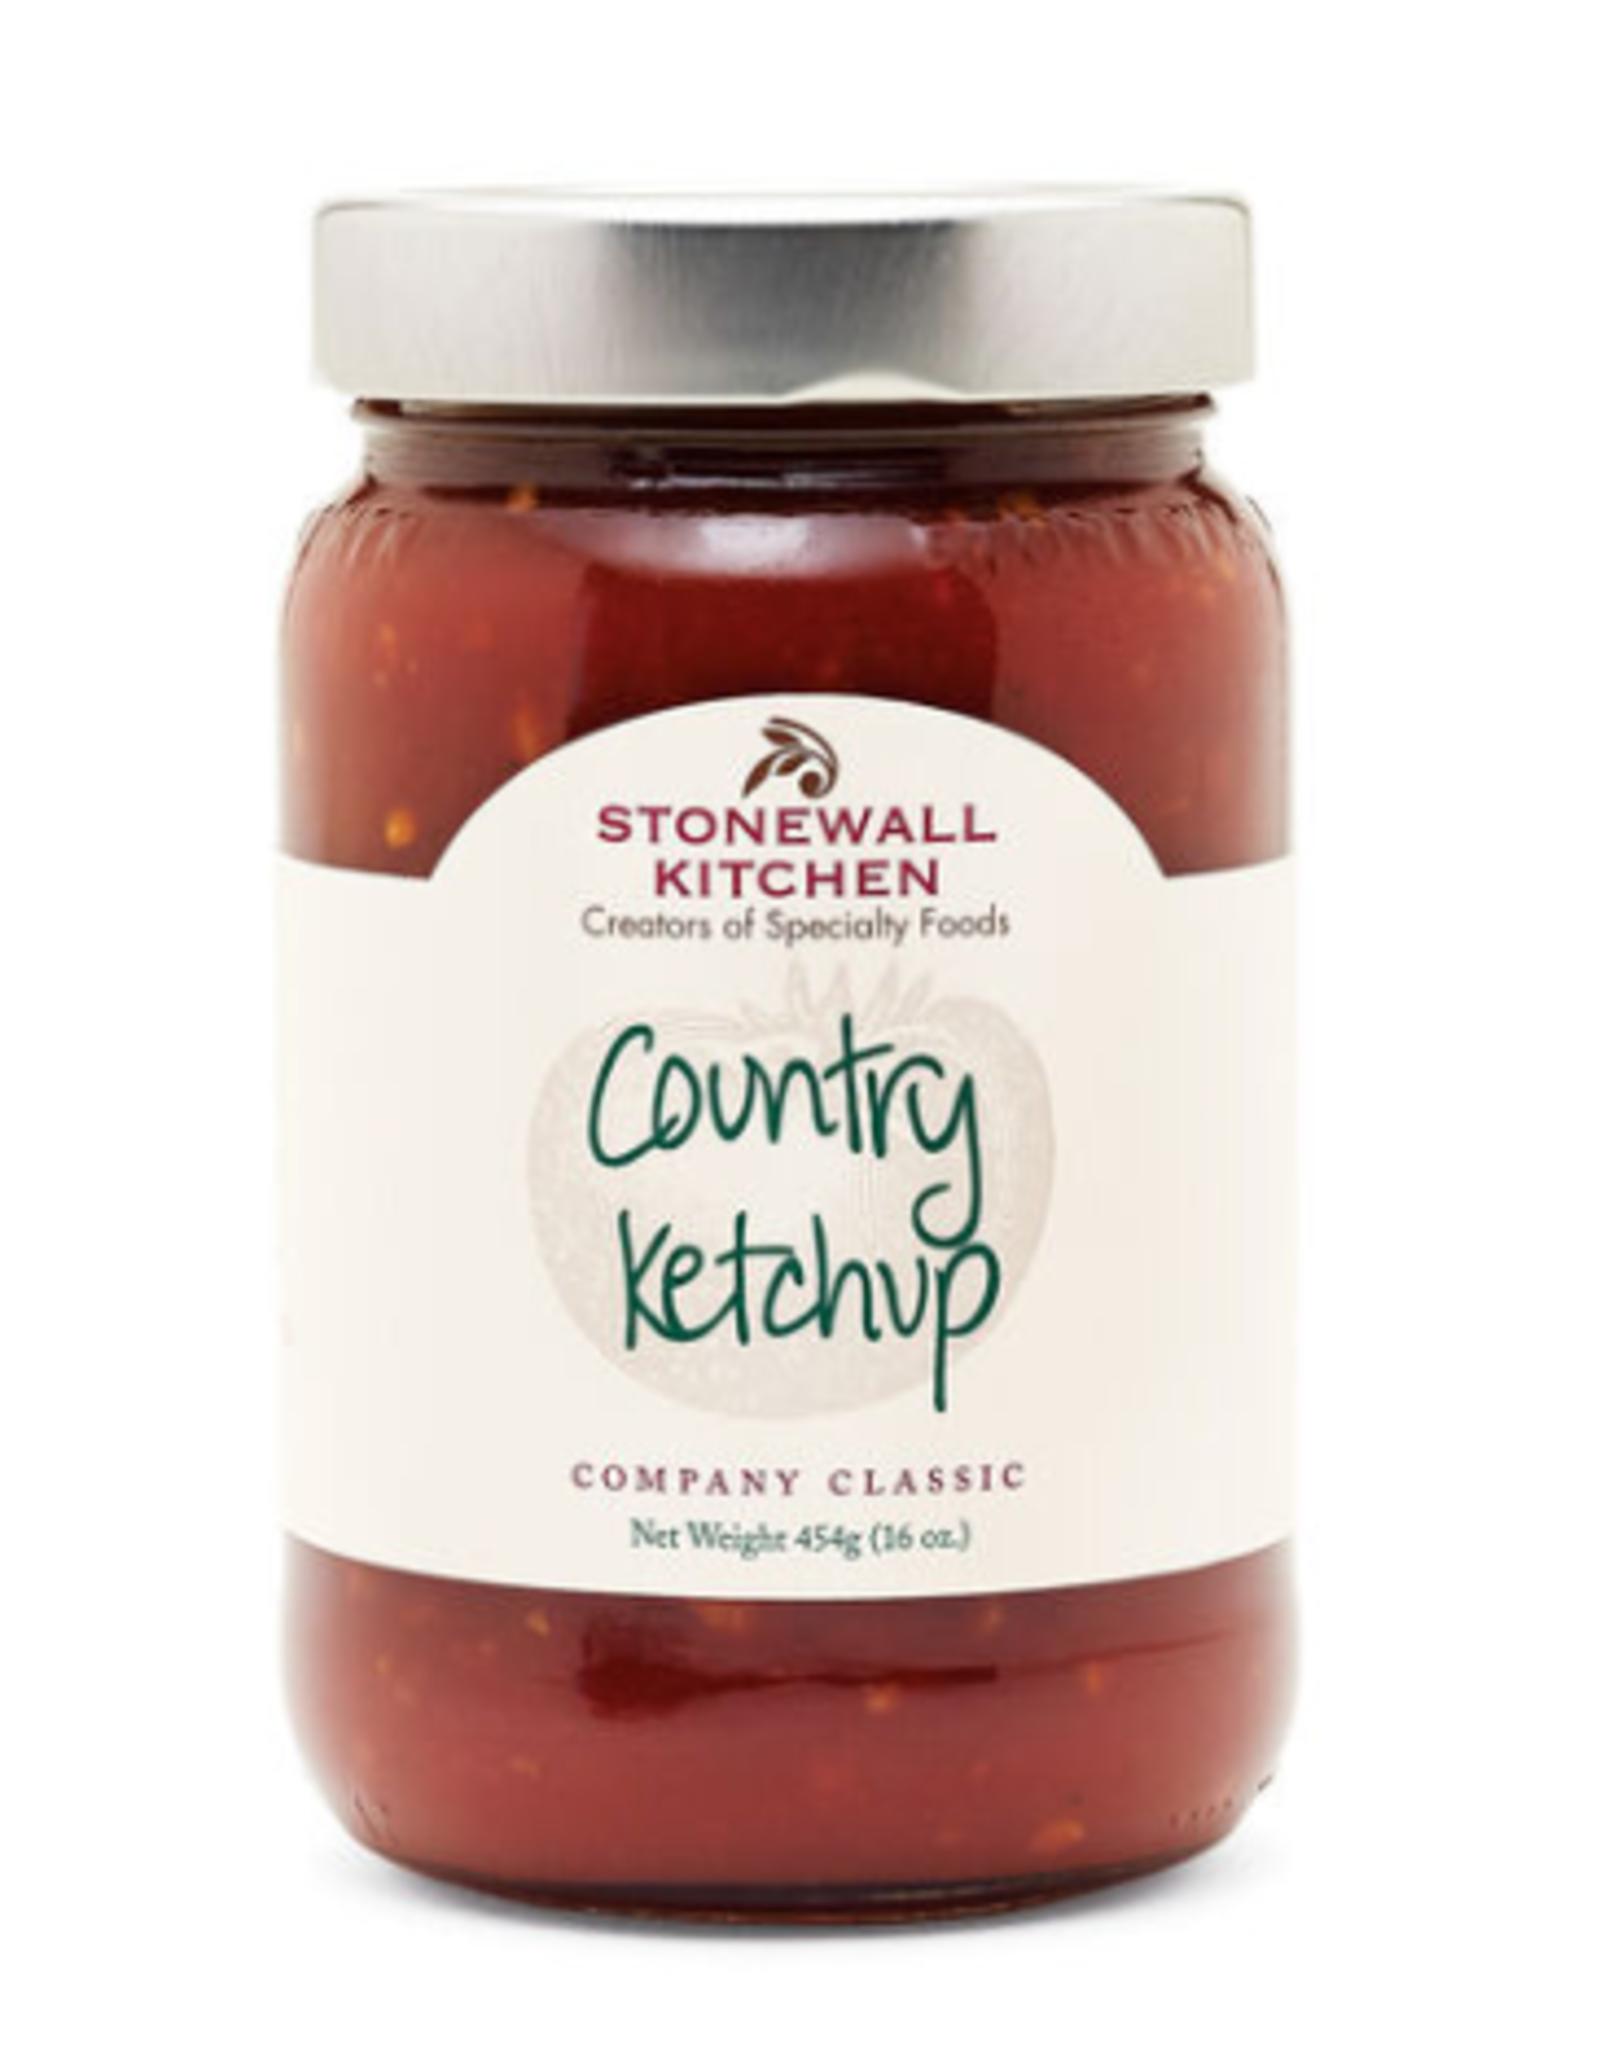 Stonewall Kitchen Country Ketchup